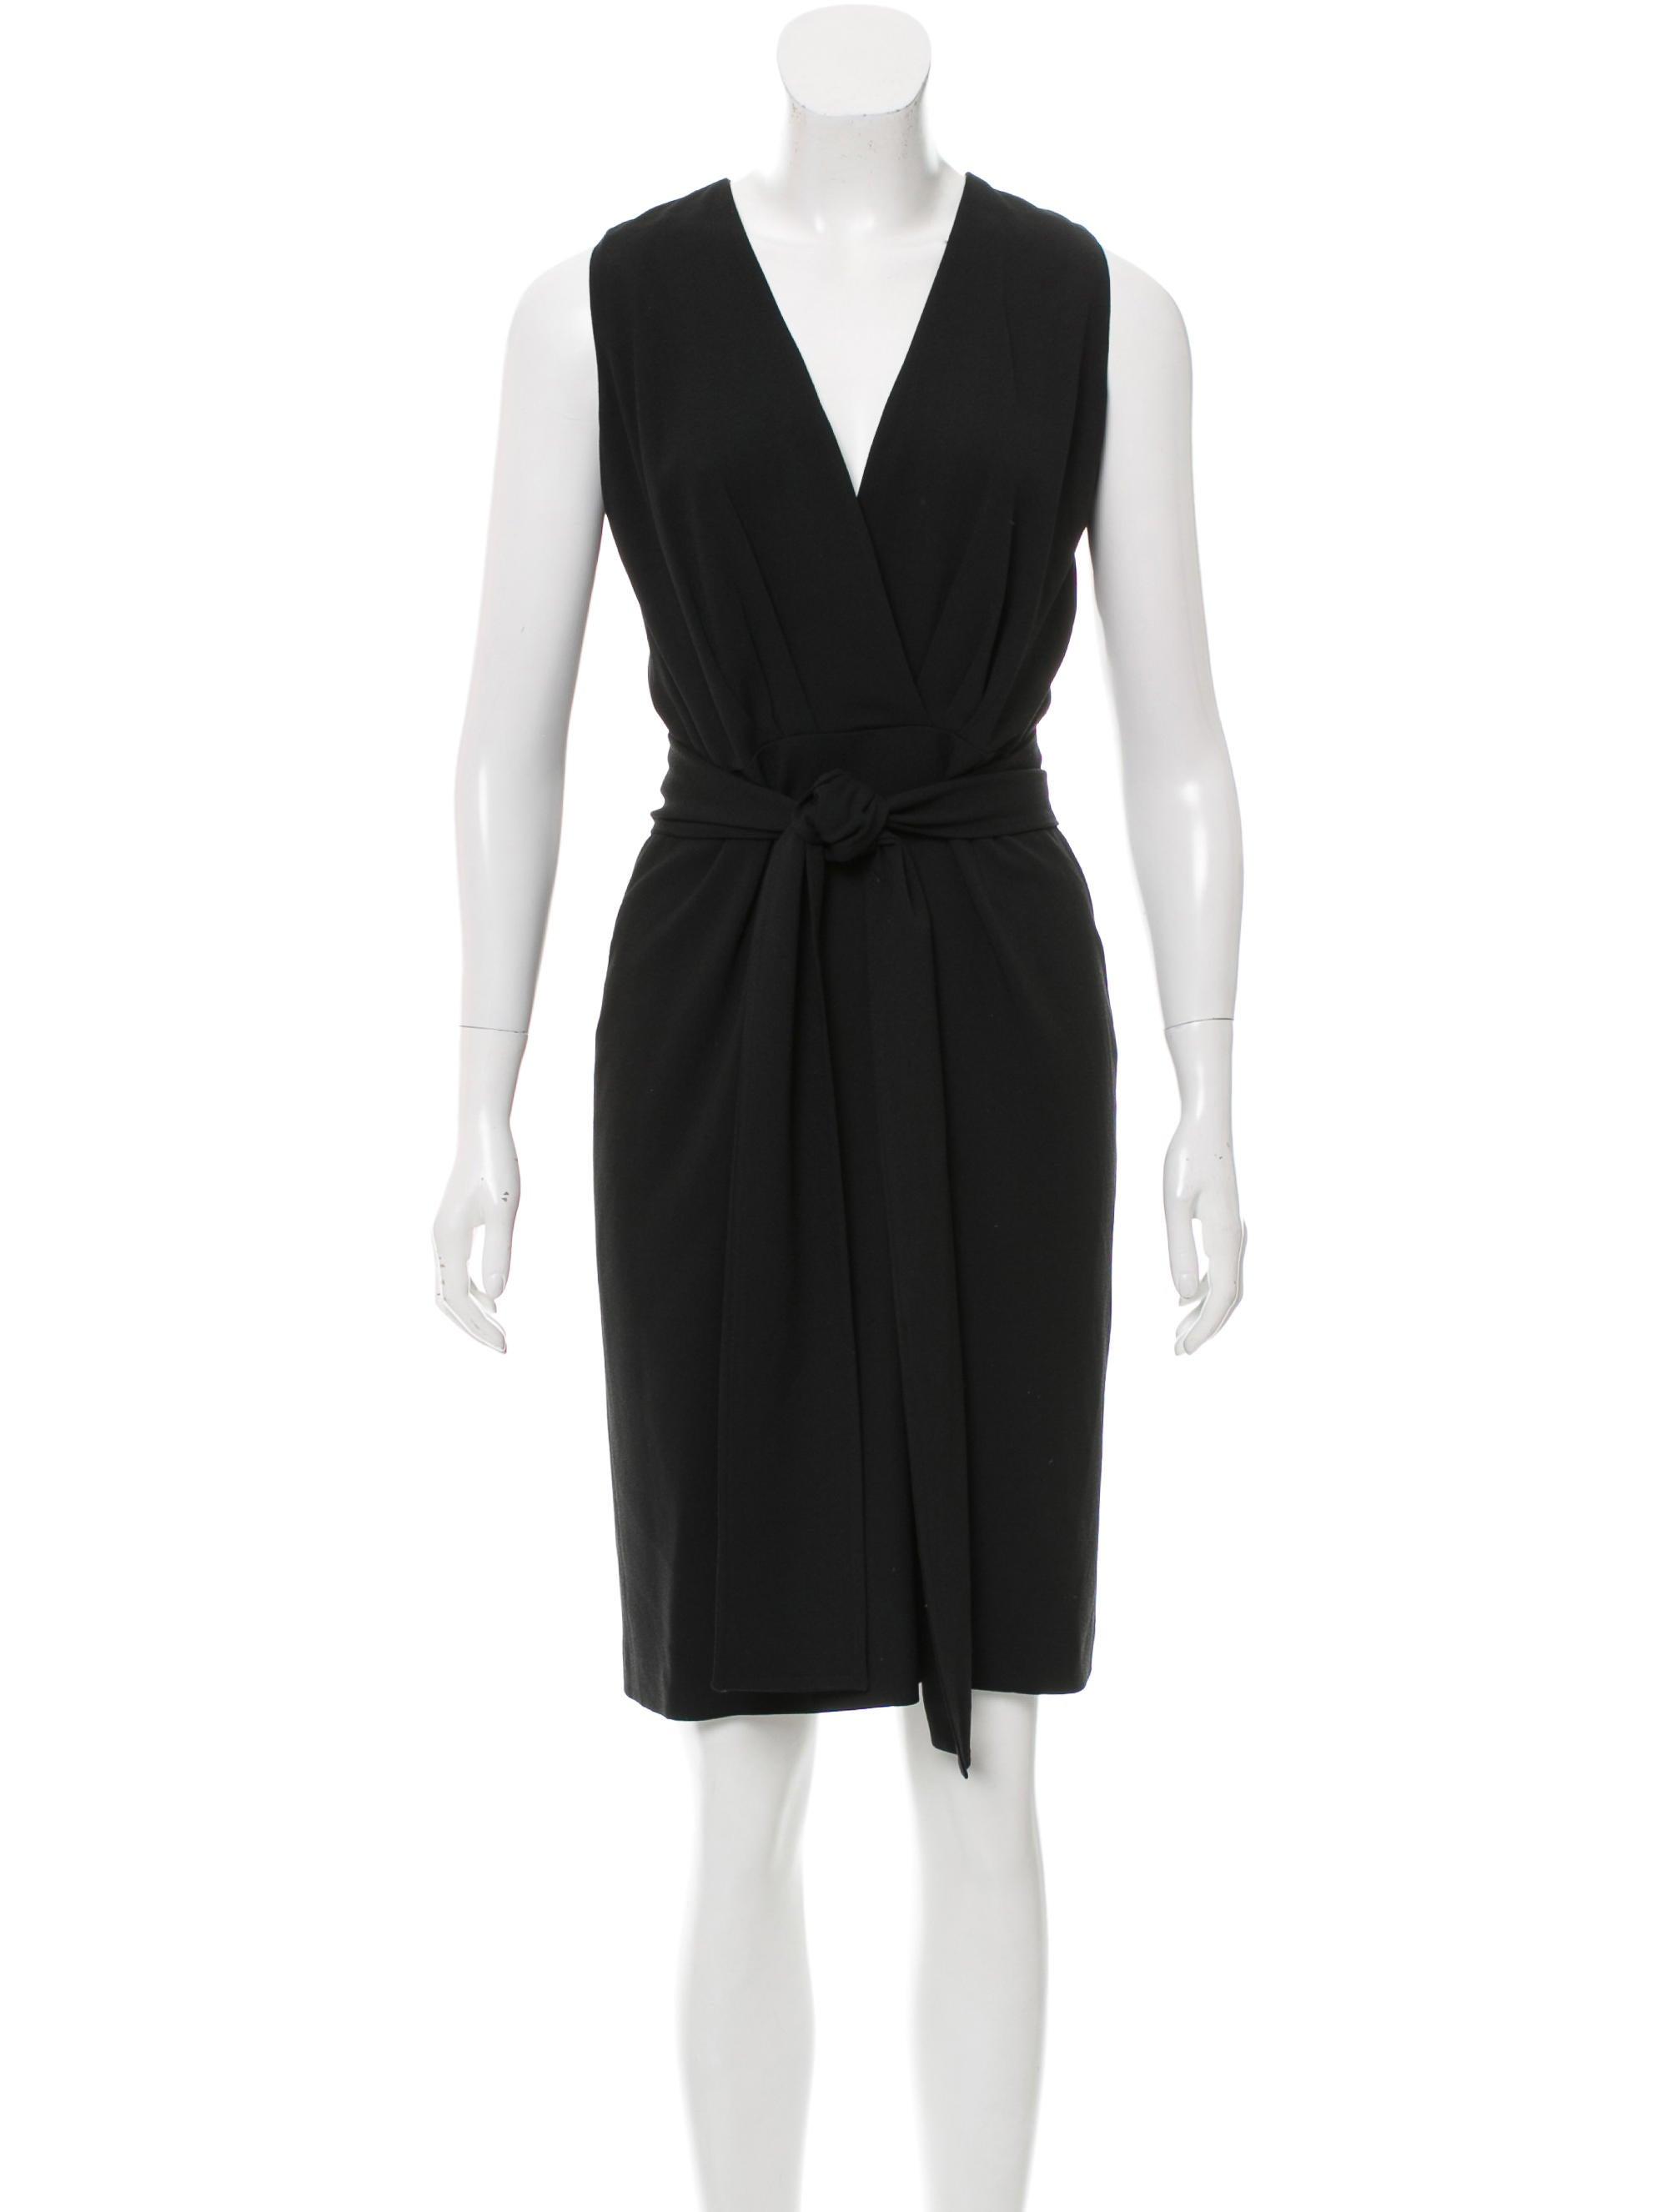 Gucci Sleeveless Sash Tie Dress - Clothing - GUC139129 | The RealReal